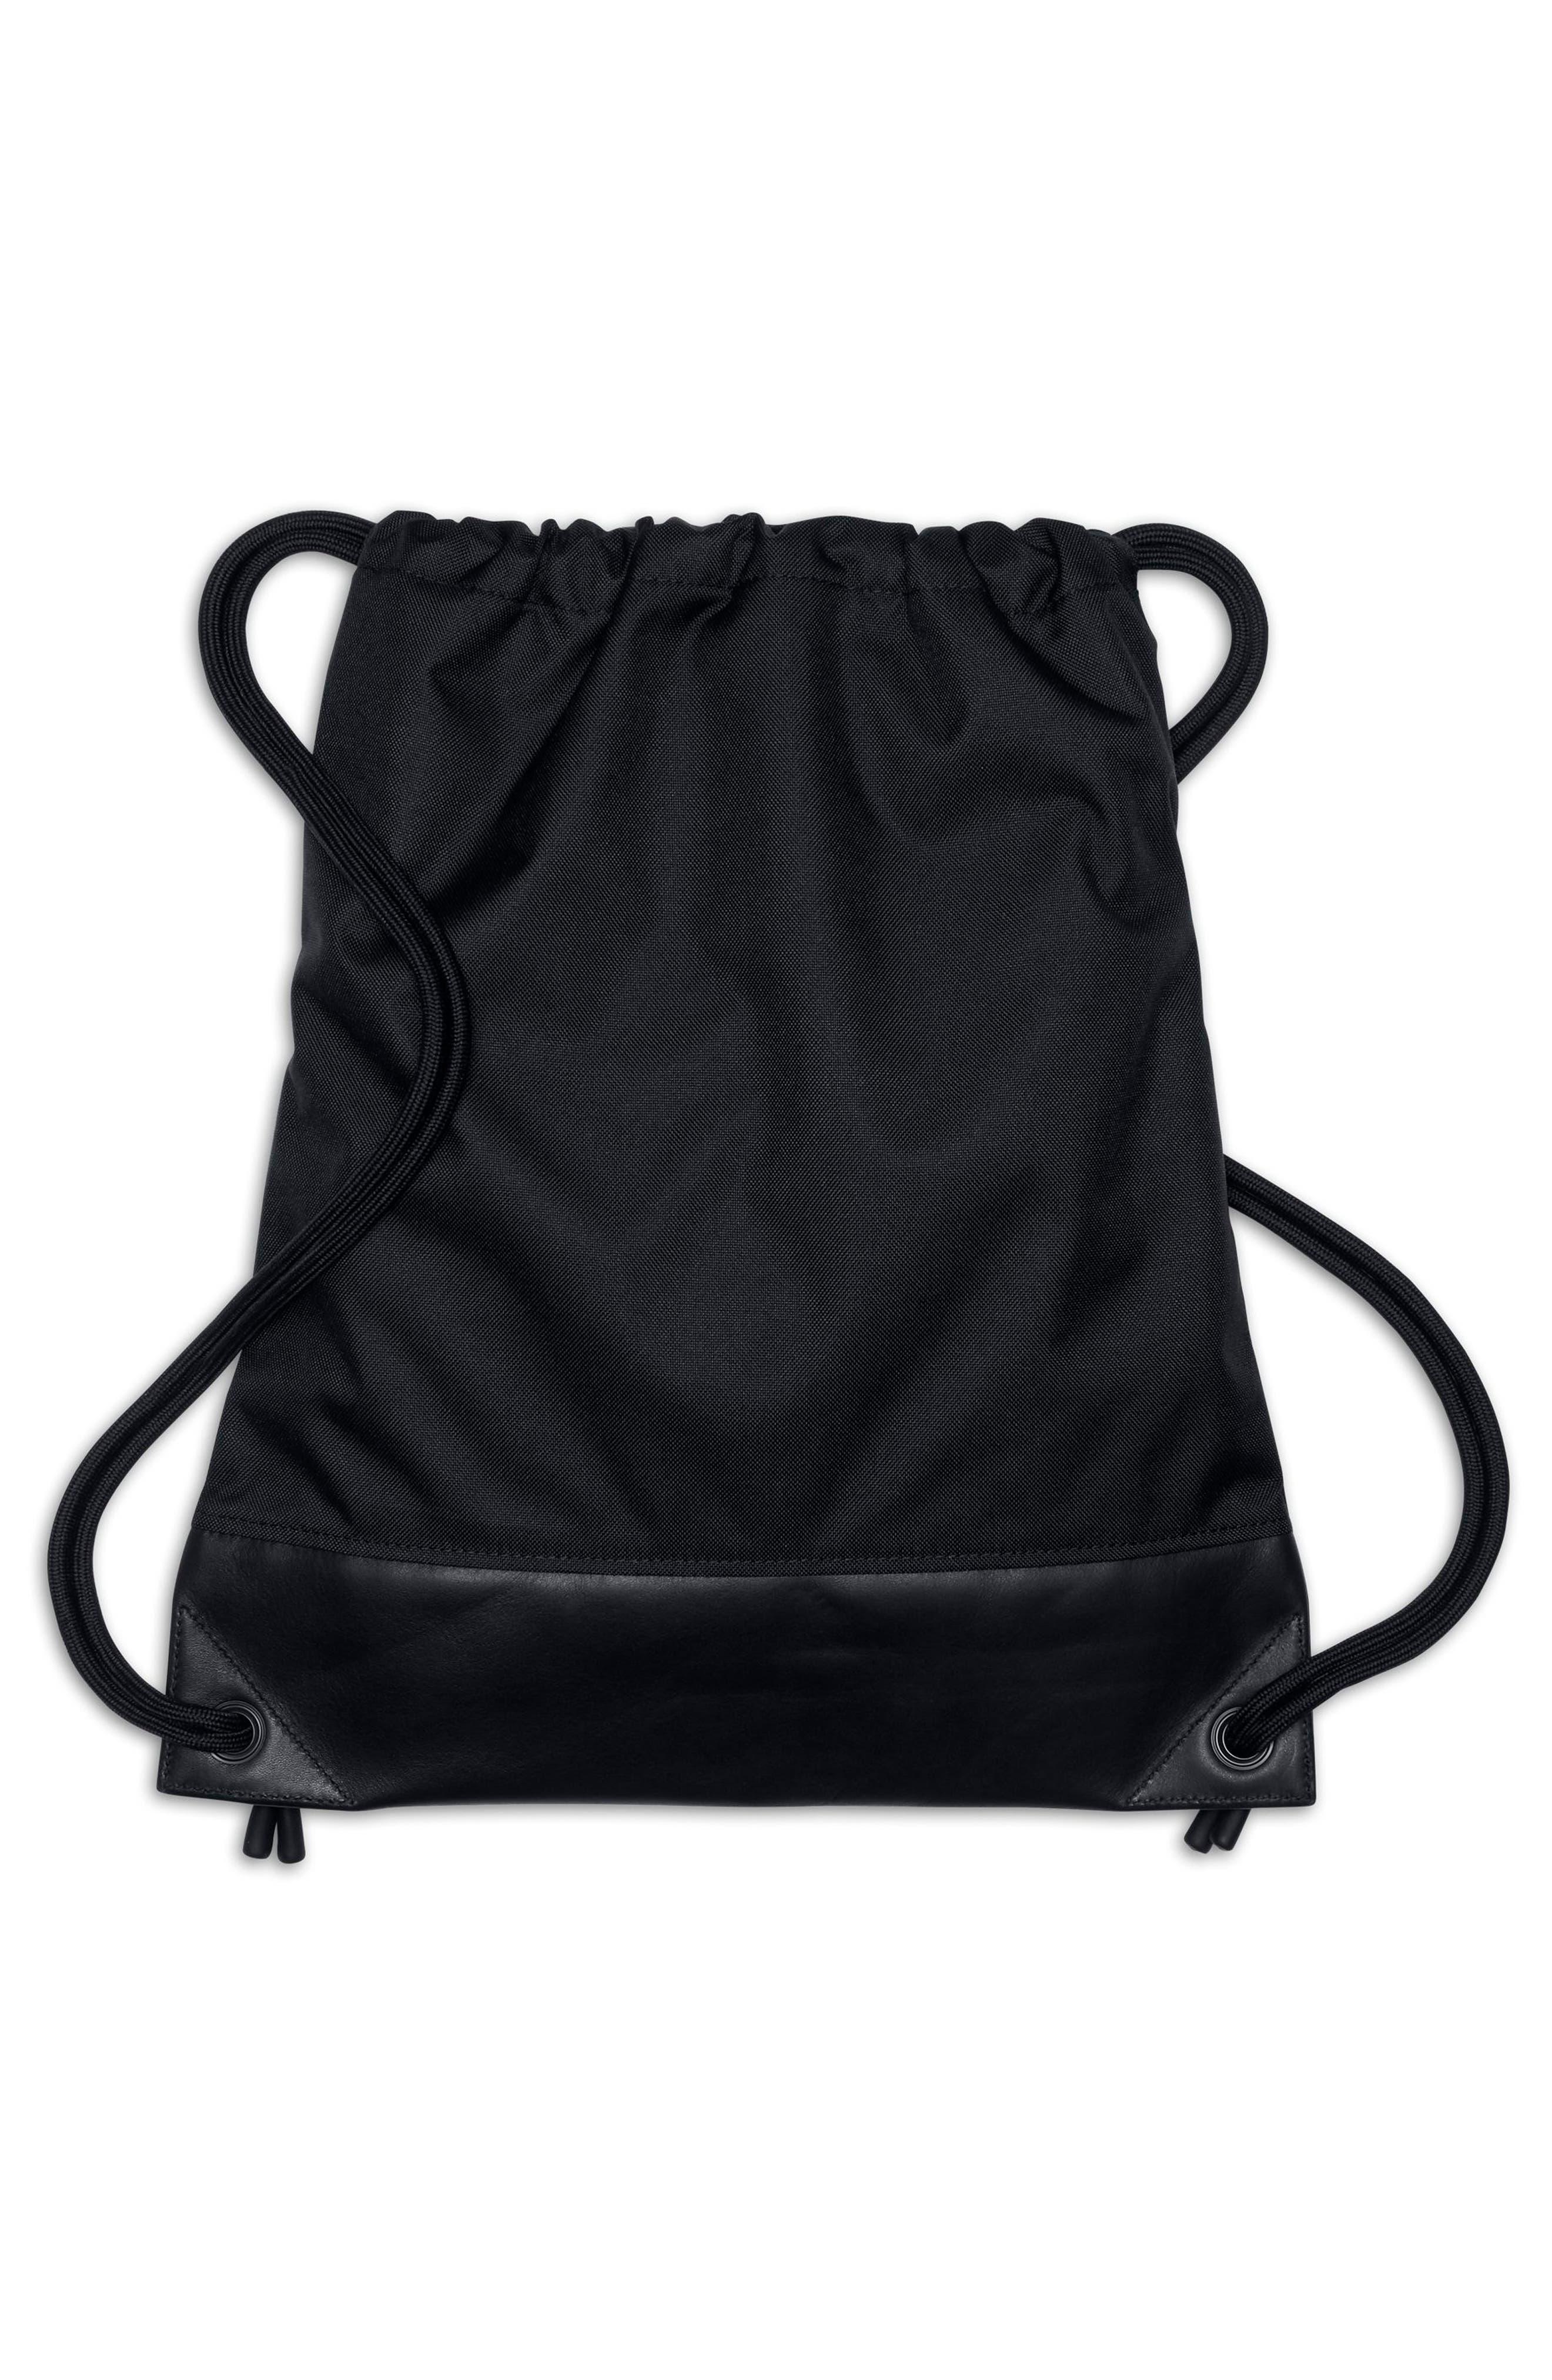 NikeLab Gym Sack,                             Alternate thumbnail 3, color,                             BLACK/ BLACK/ BLACK